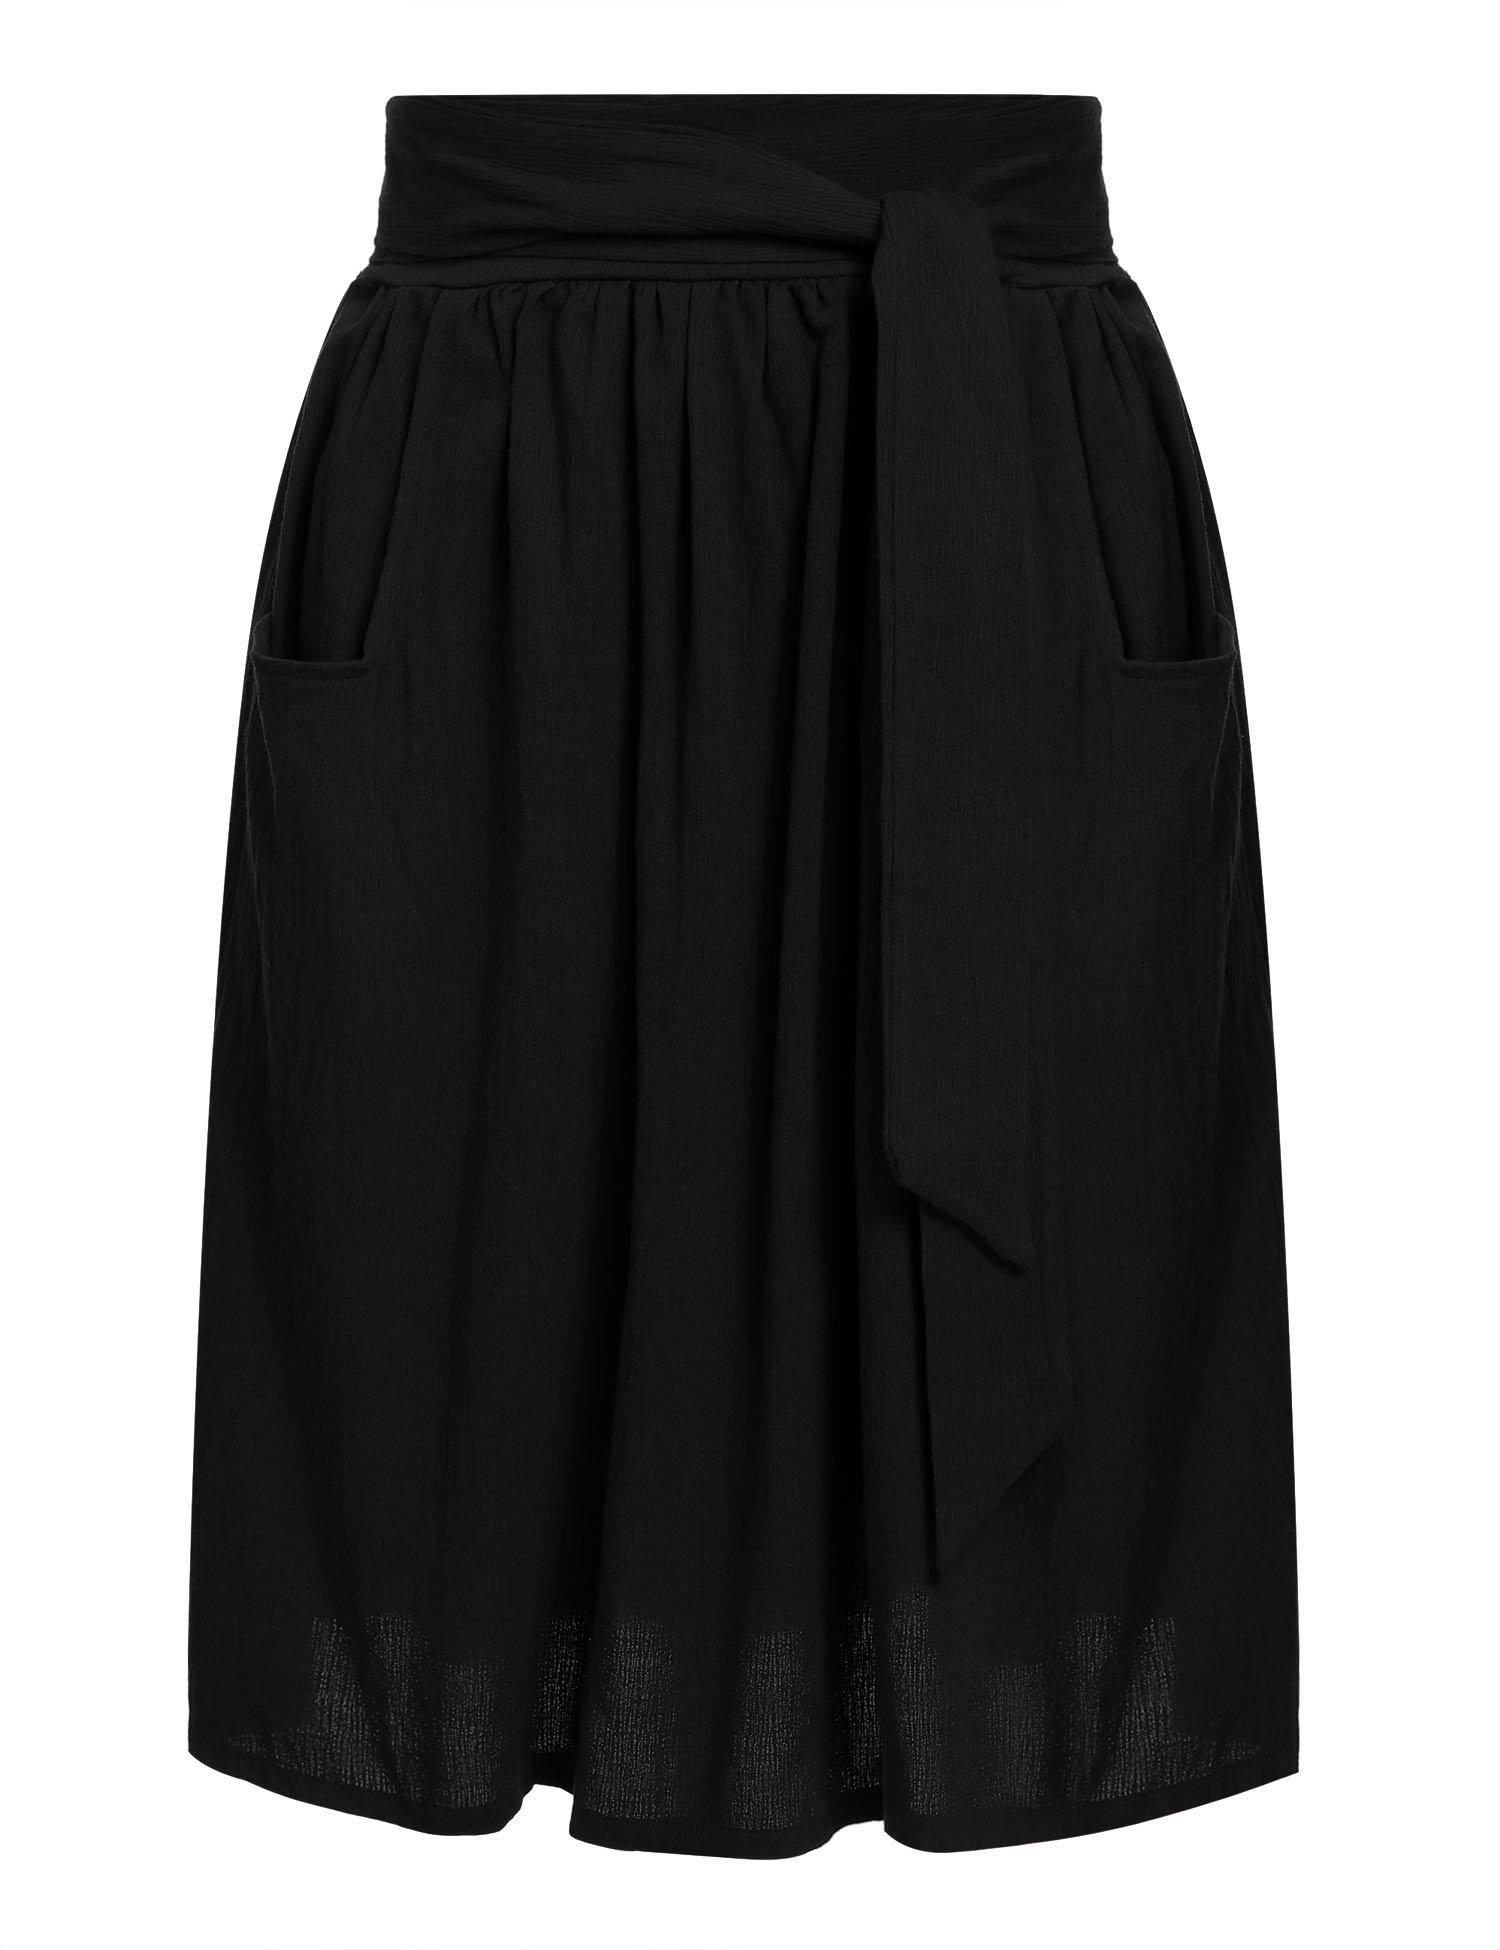 Zeagoo Women's Cotton A Line Tie Belt Street Pockets High Waist Pleated Casual Midi Skirts,Black,Medium